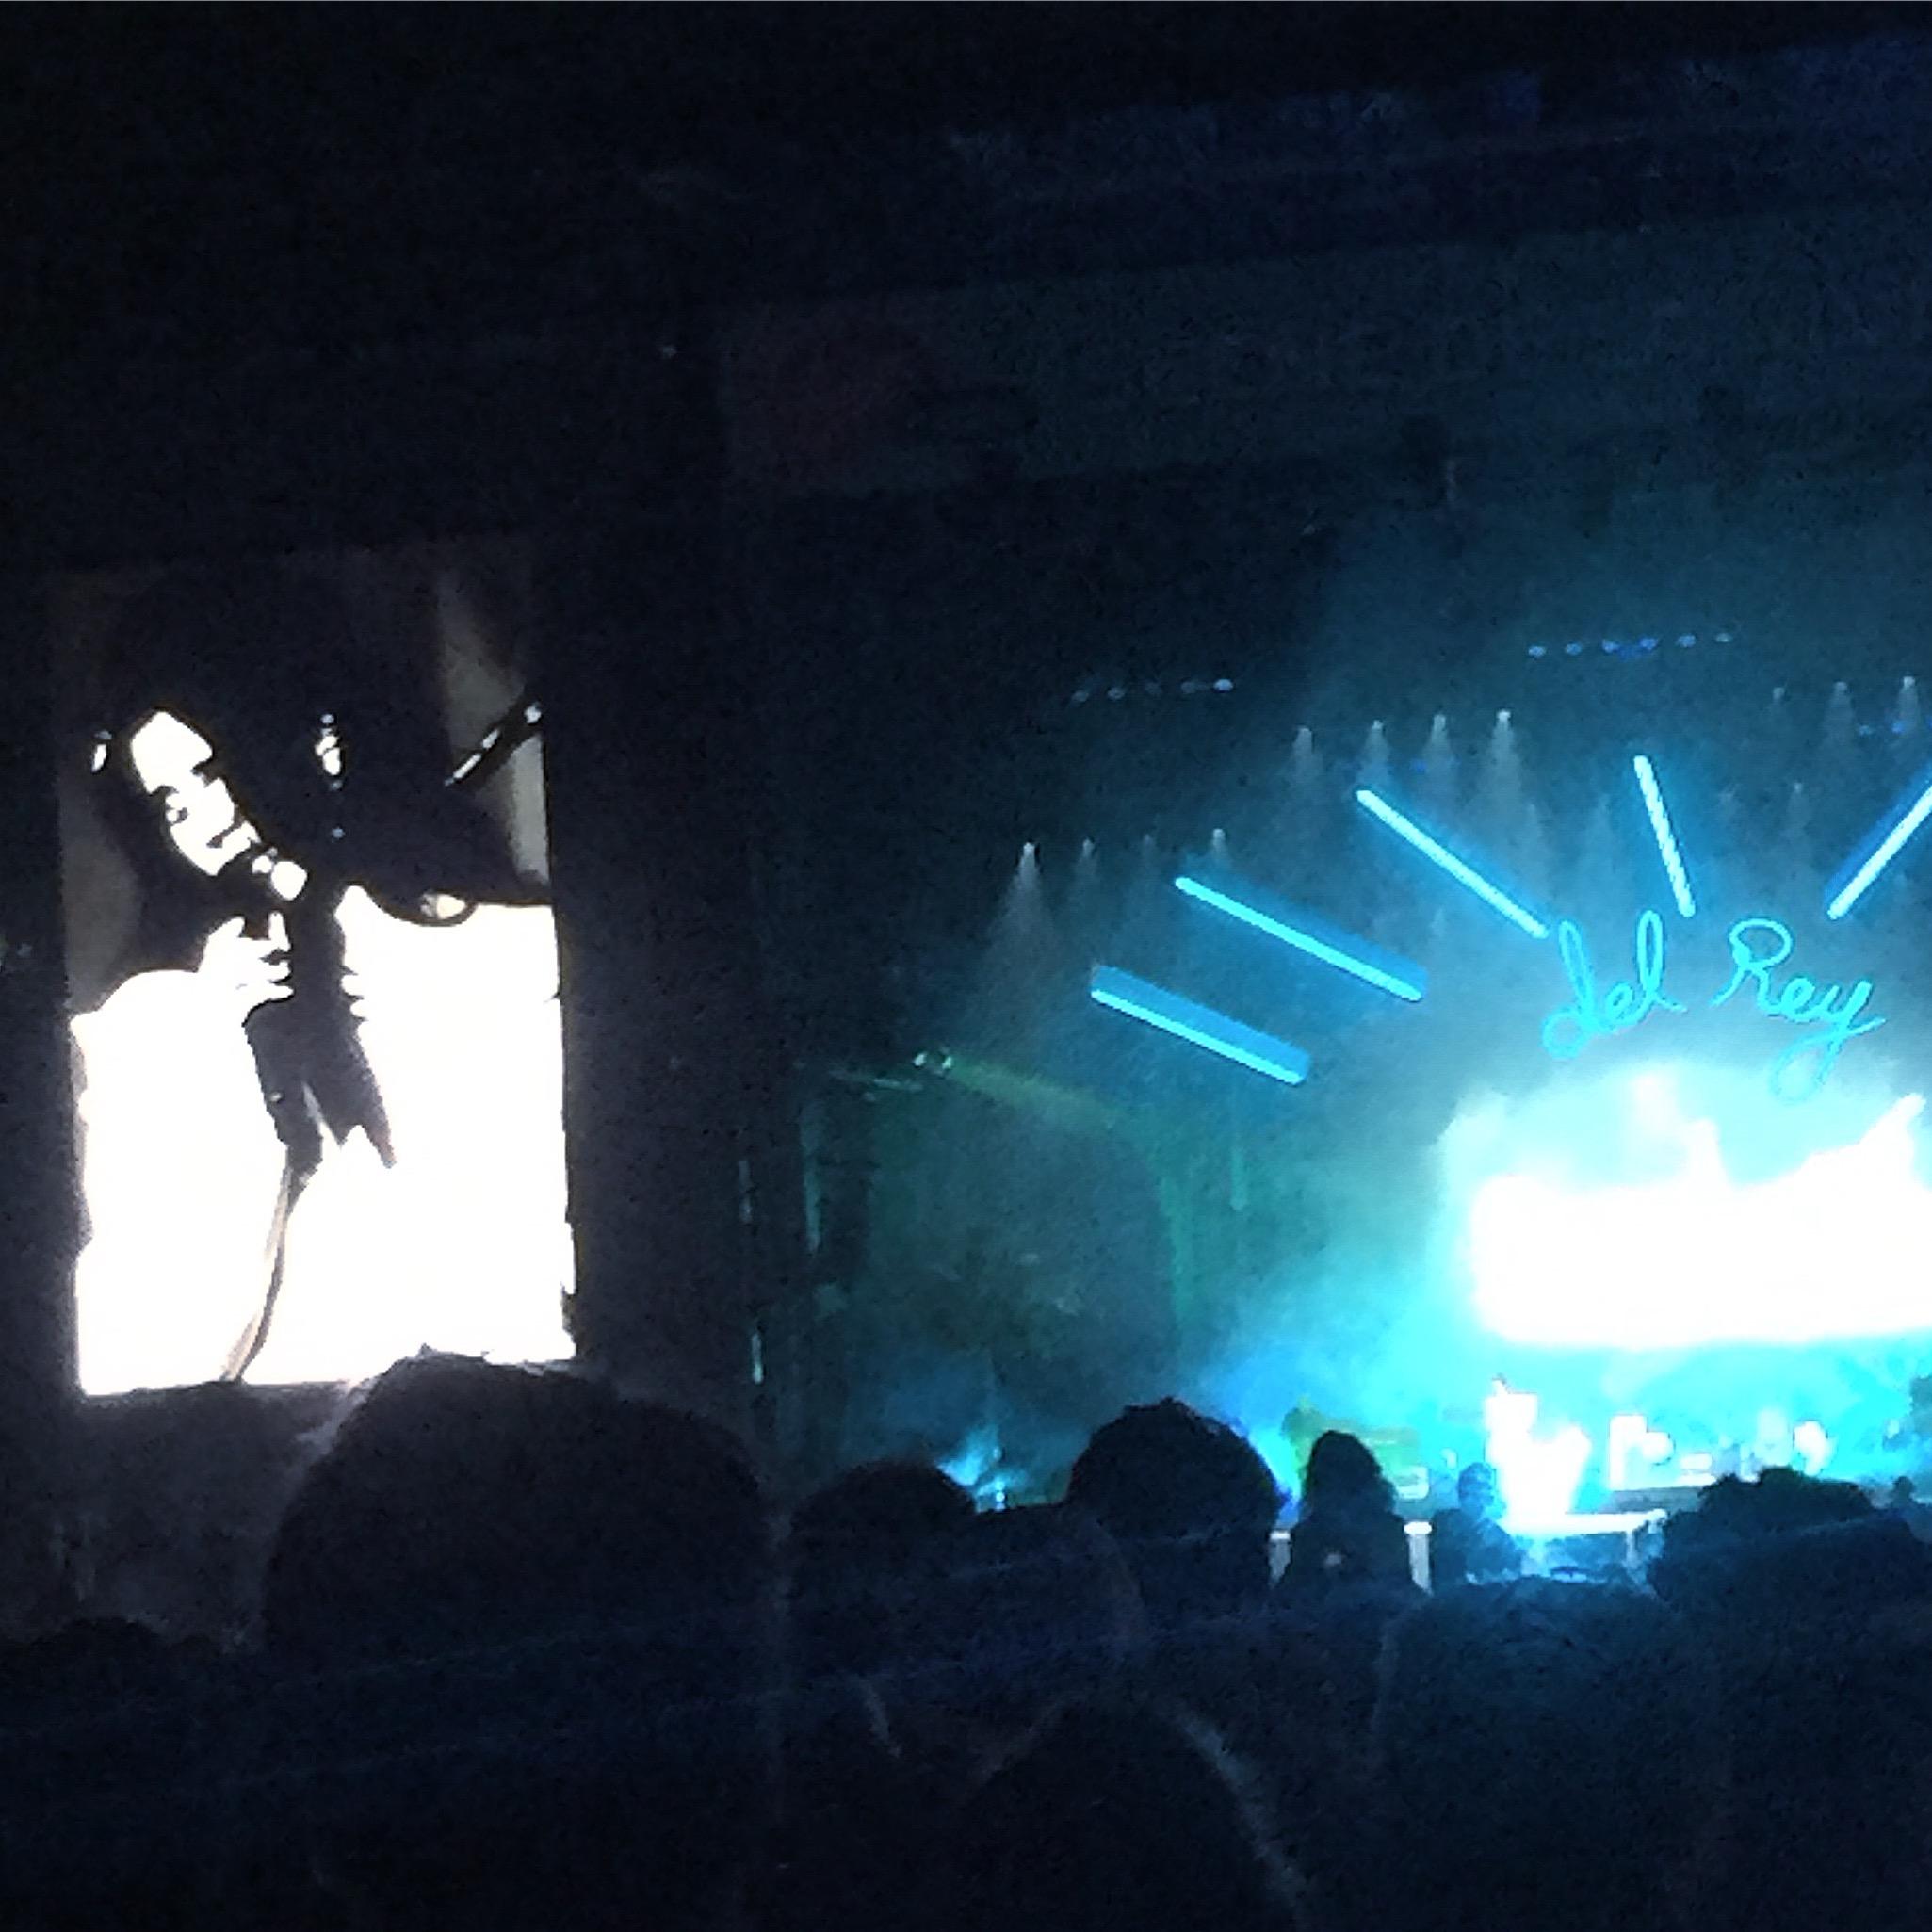 Lana Del Rey - music - Osheaga - festival - musique